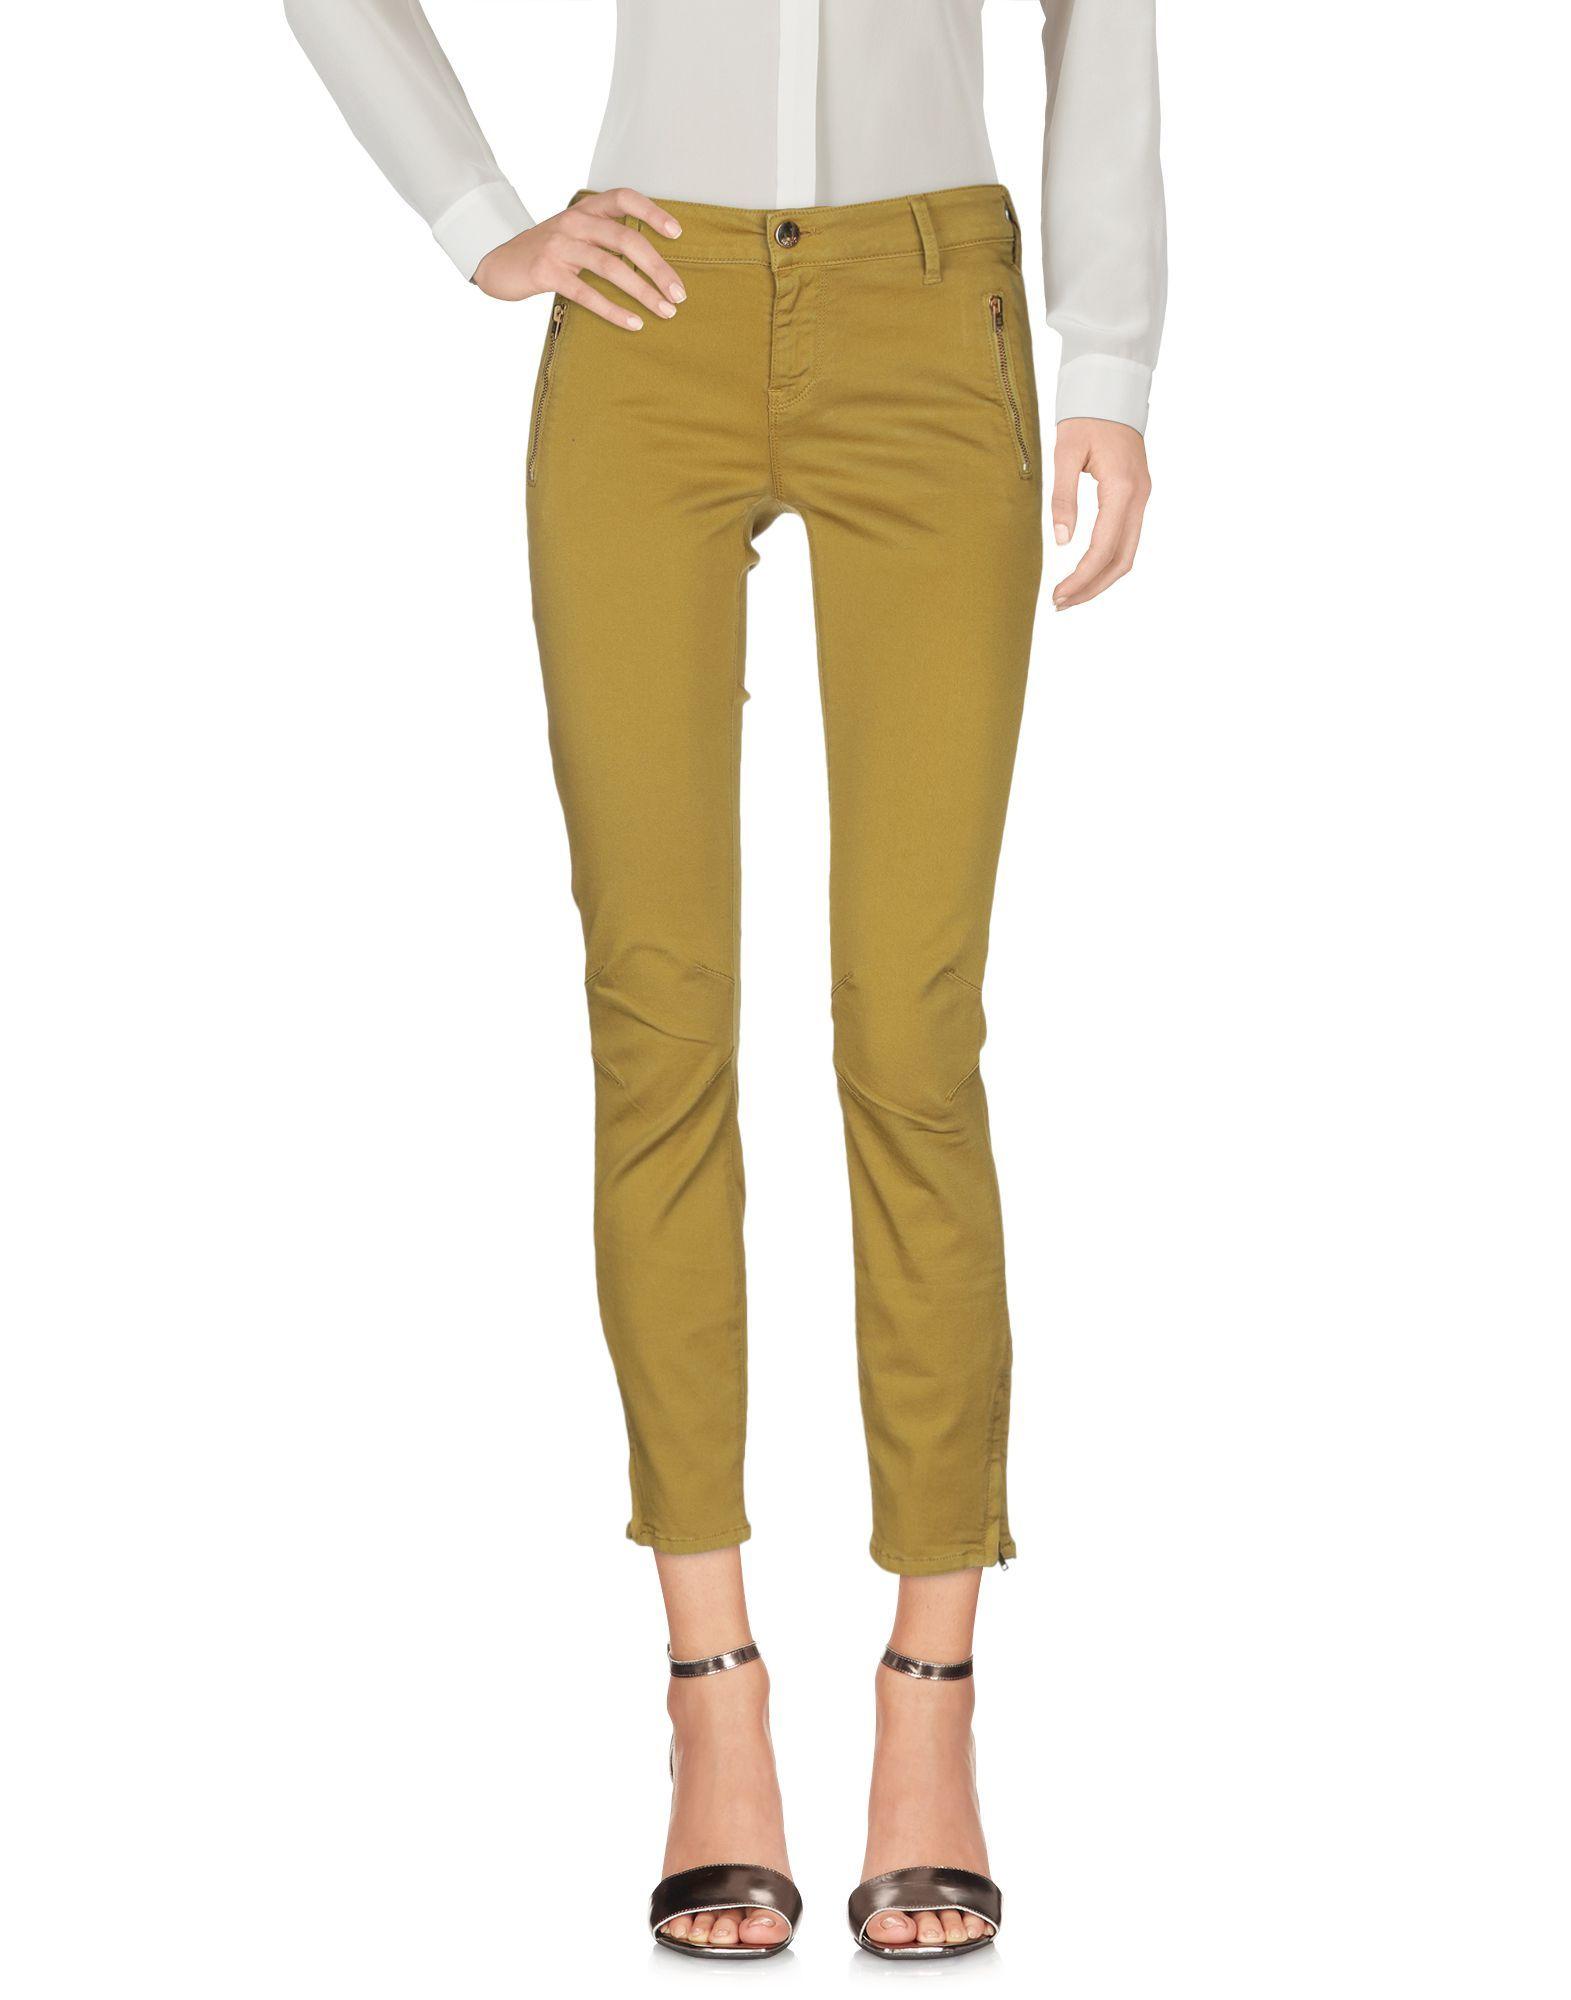 TROUSERS Woman Met Jeans Acid green Cotton